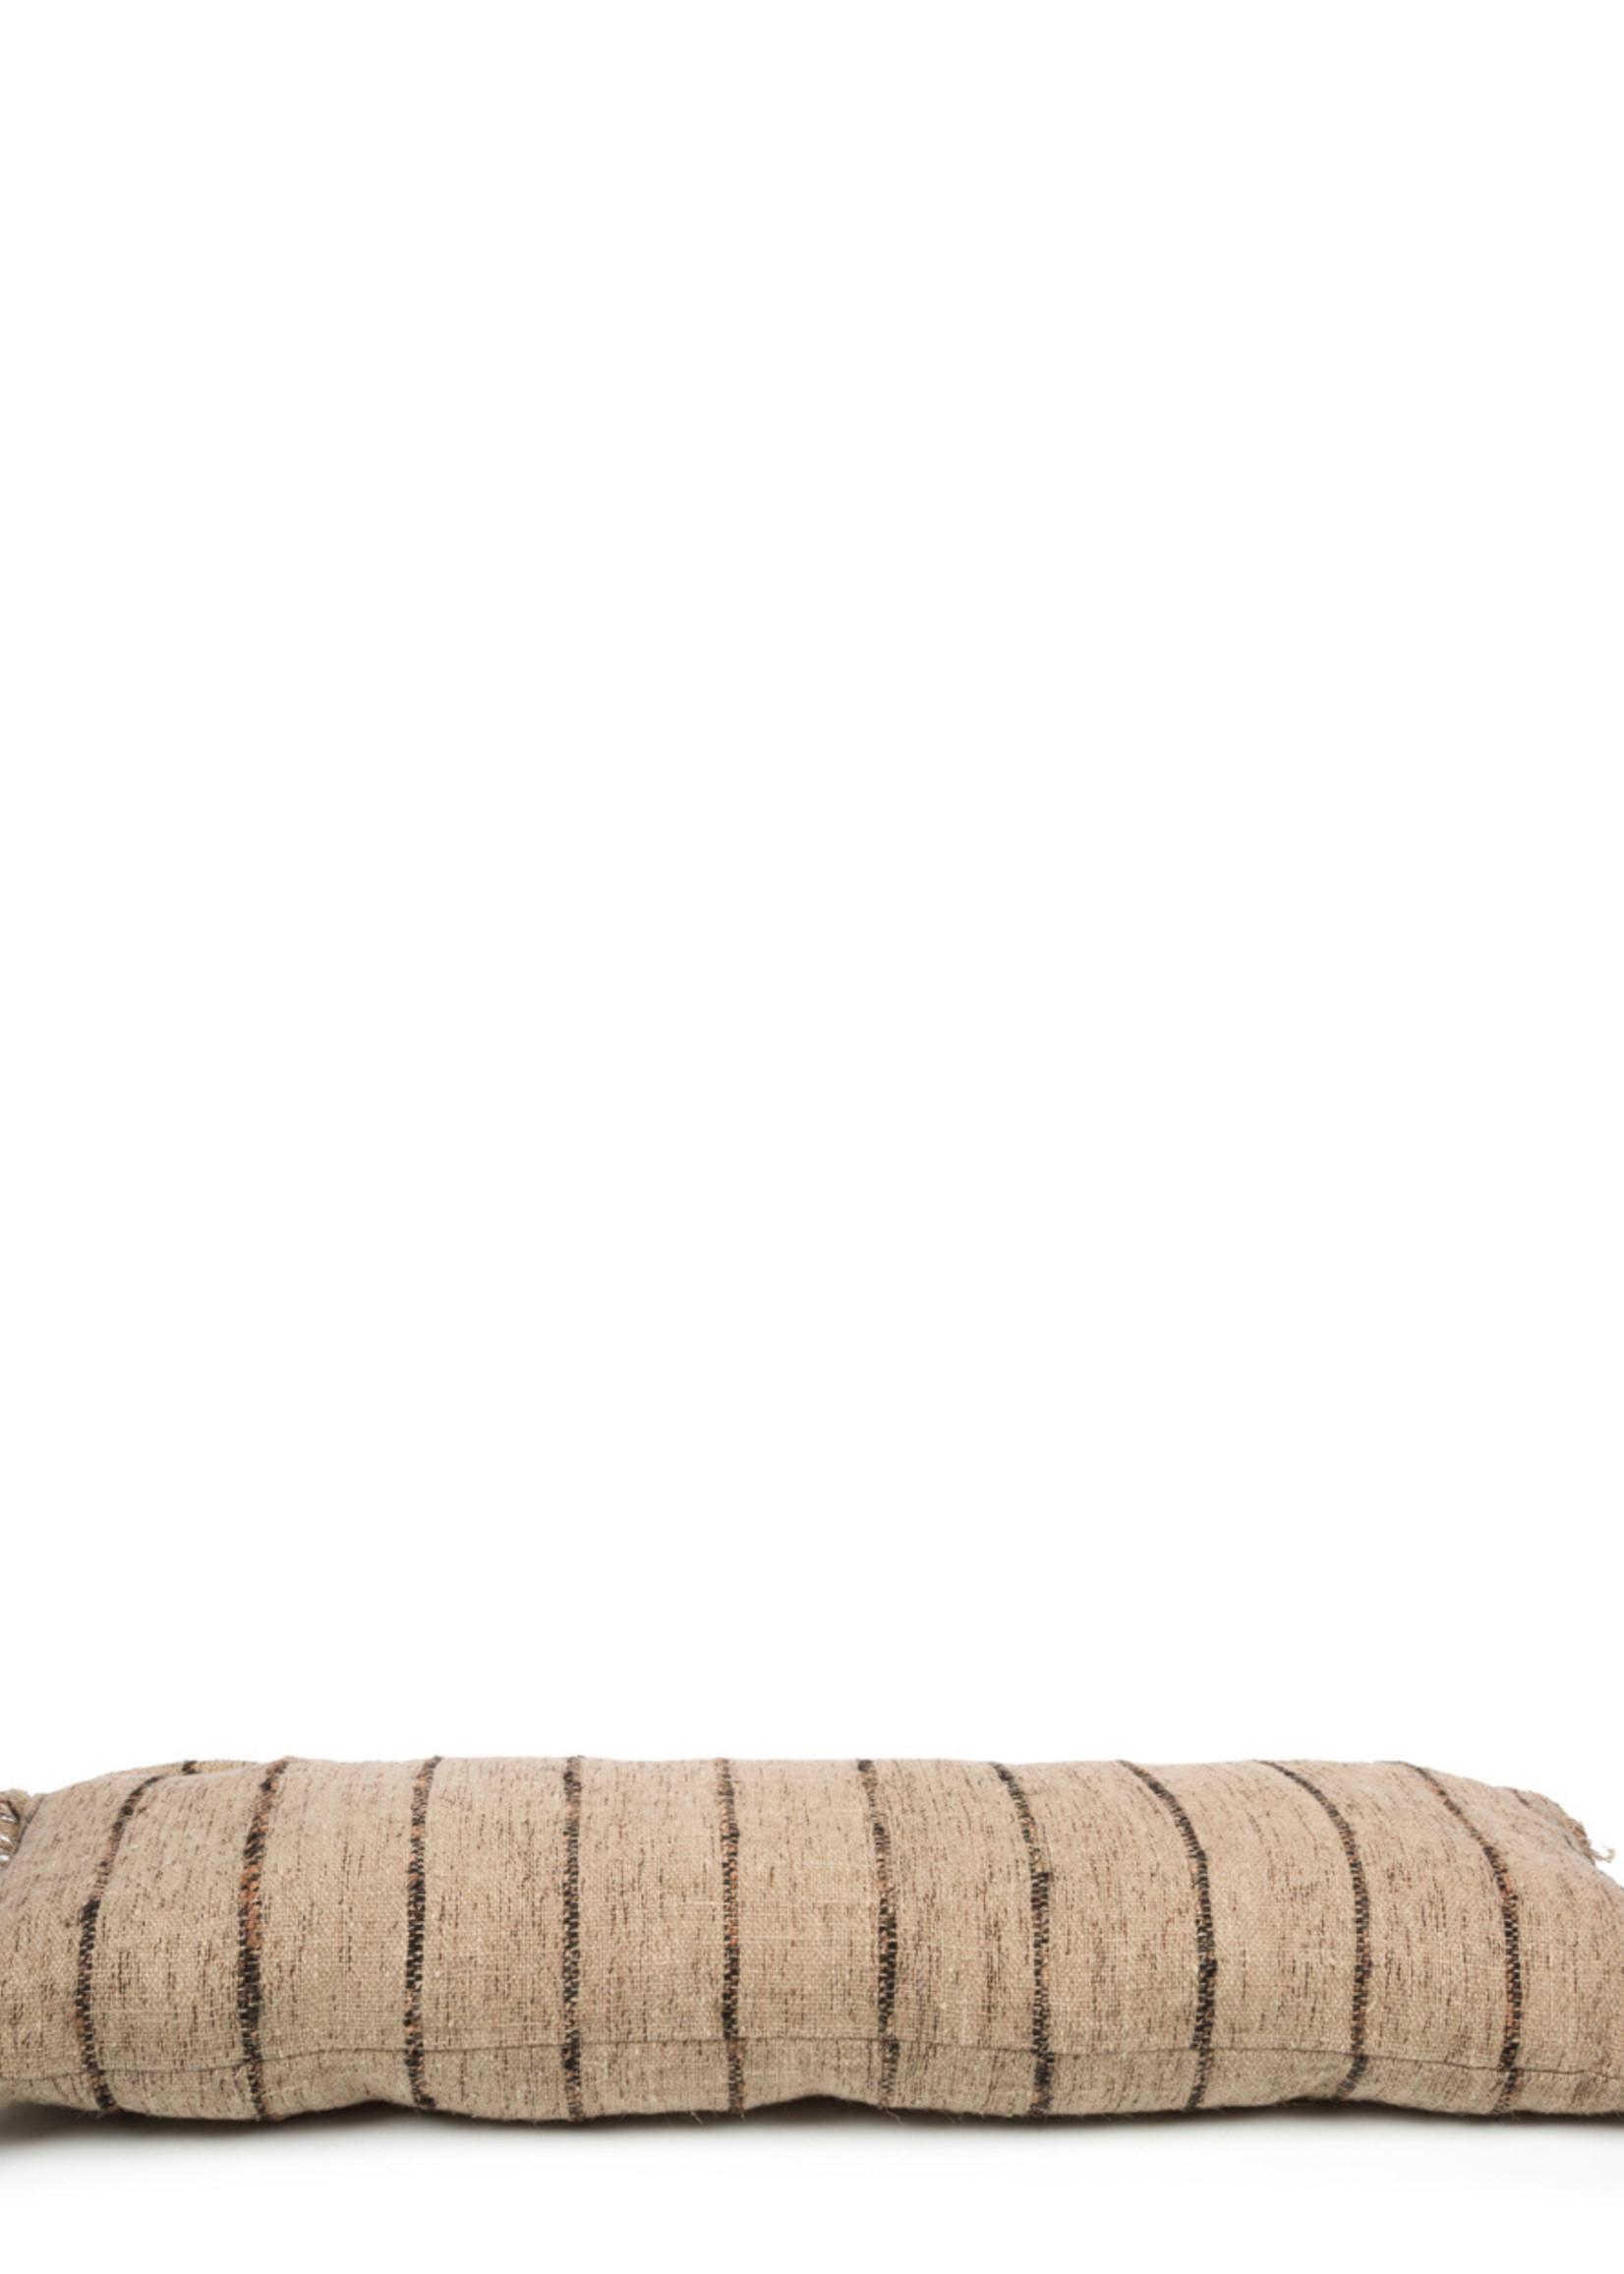 The Oh My Gee Cushion - Beige Black